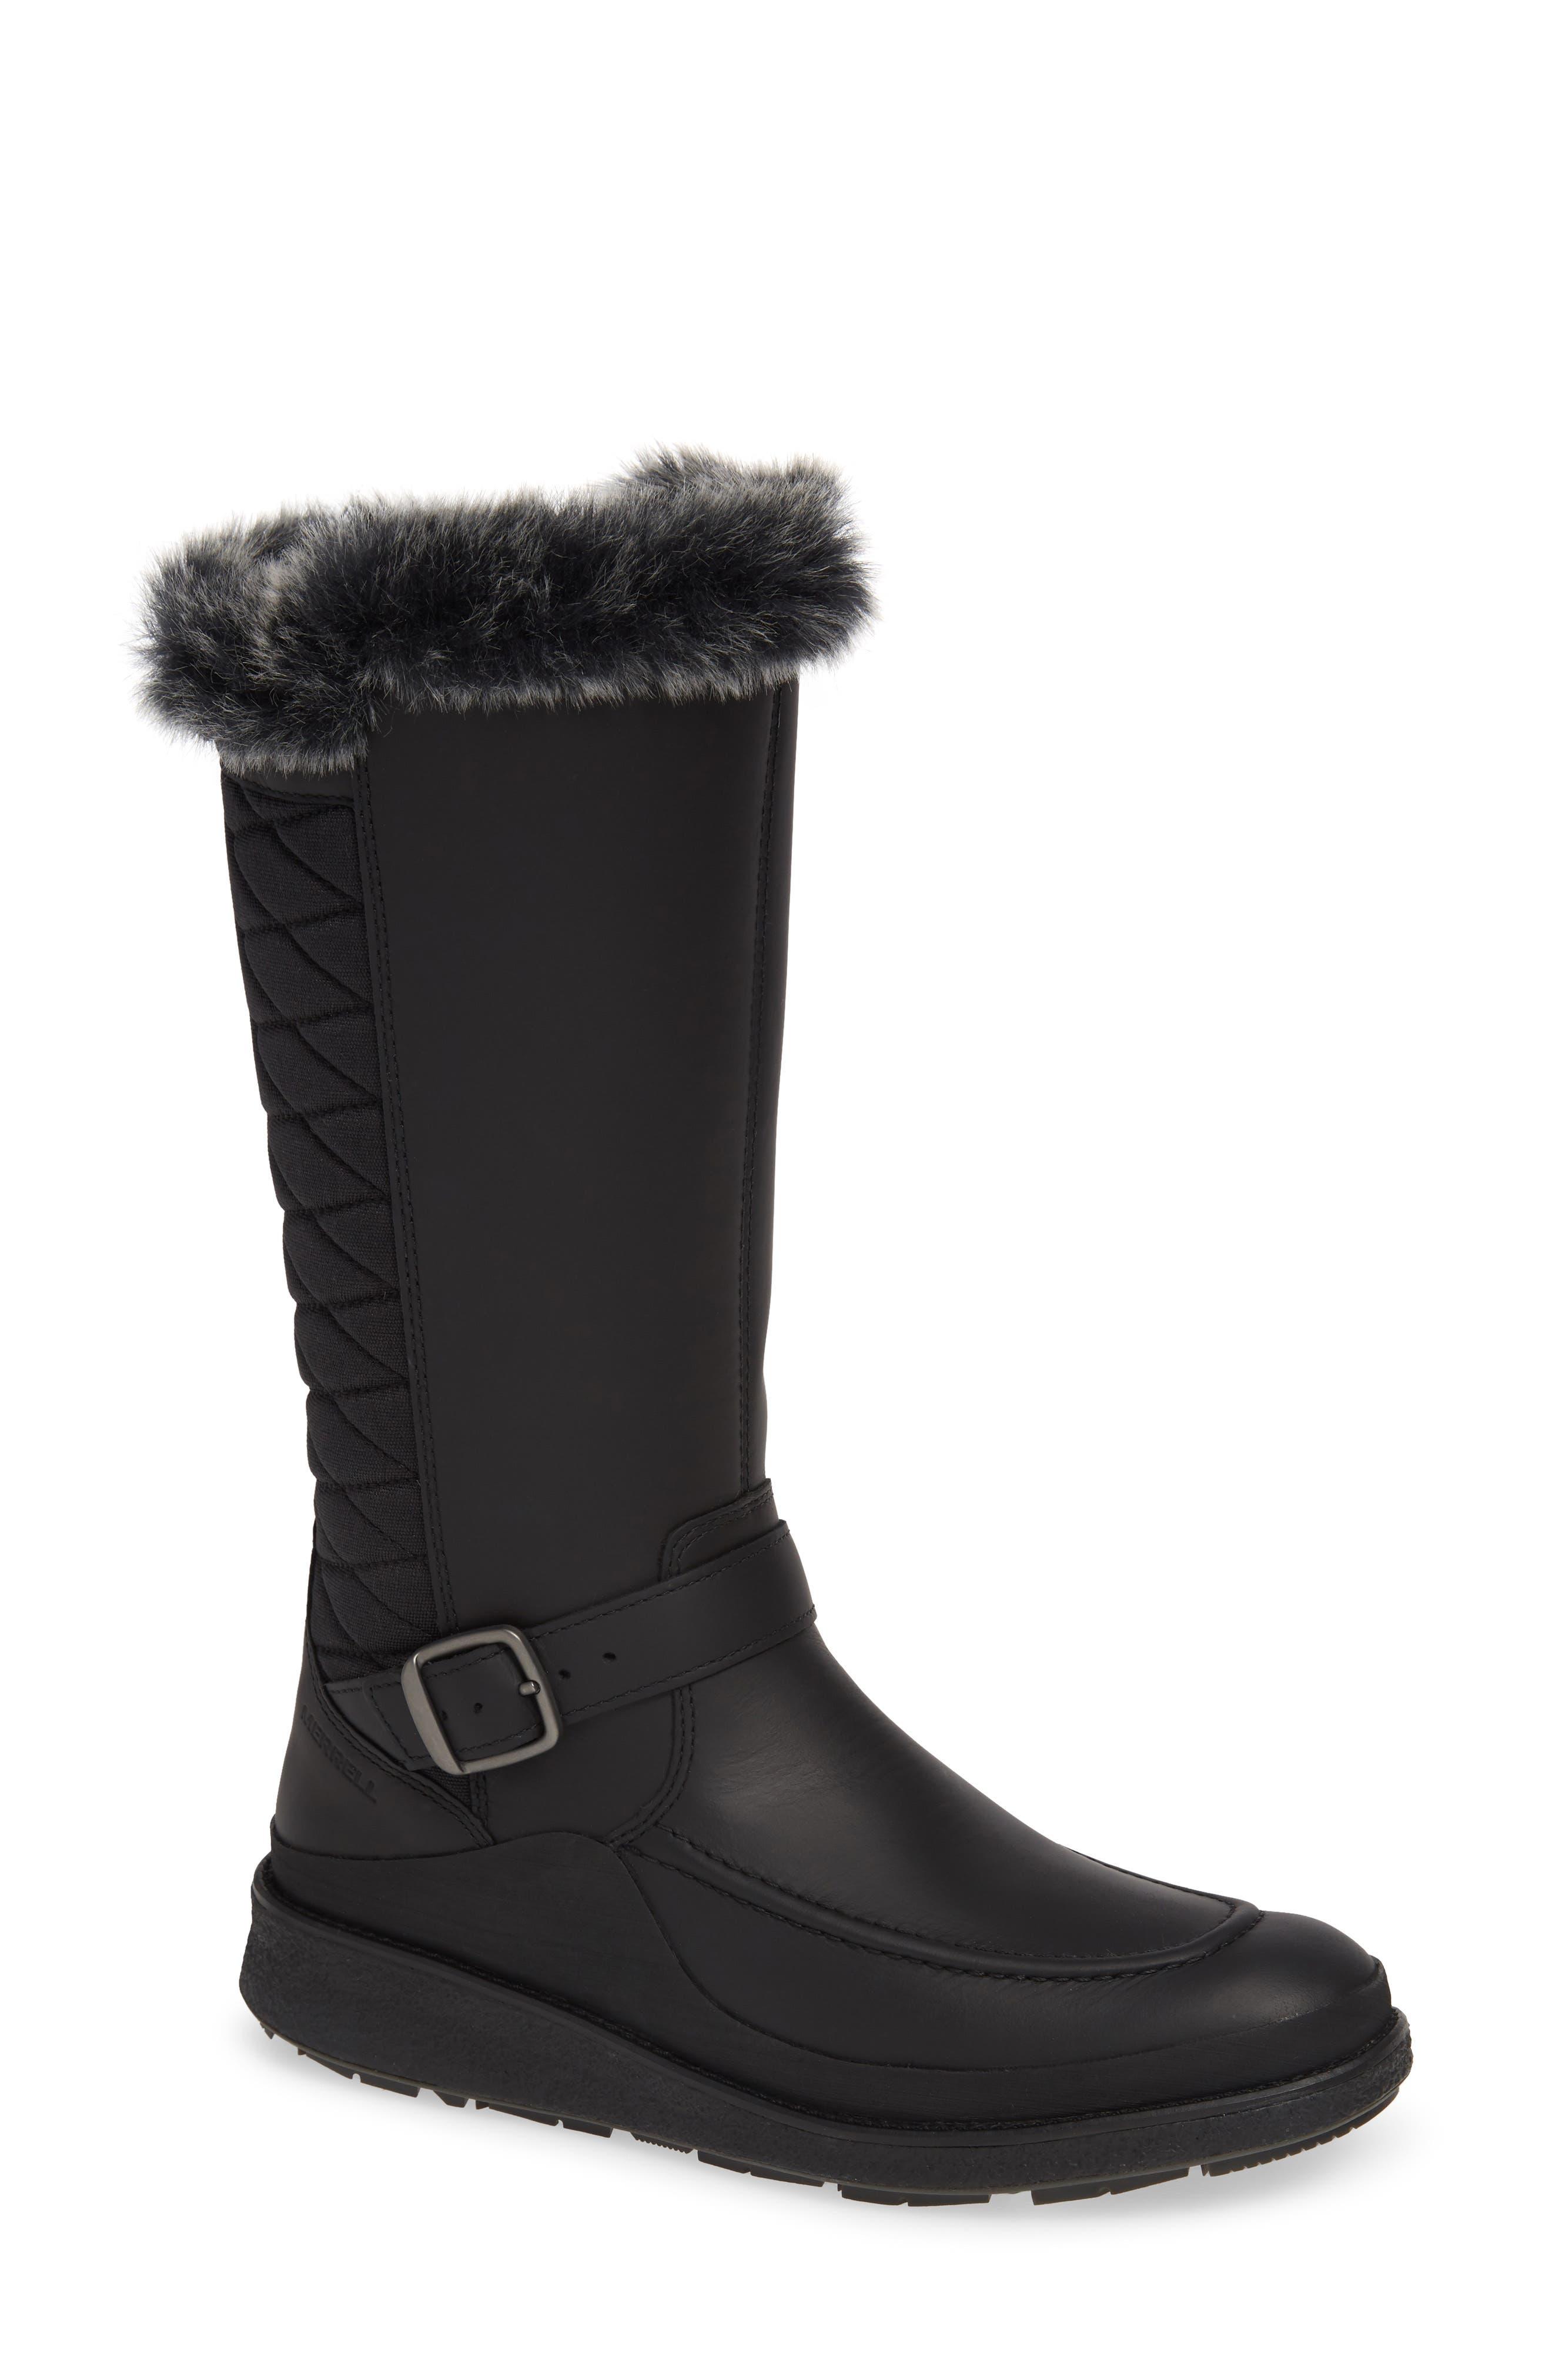 Merrell Tremblant Ezra Polar Waterproof Boot With Faux Fur Trim